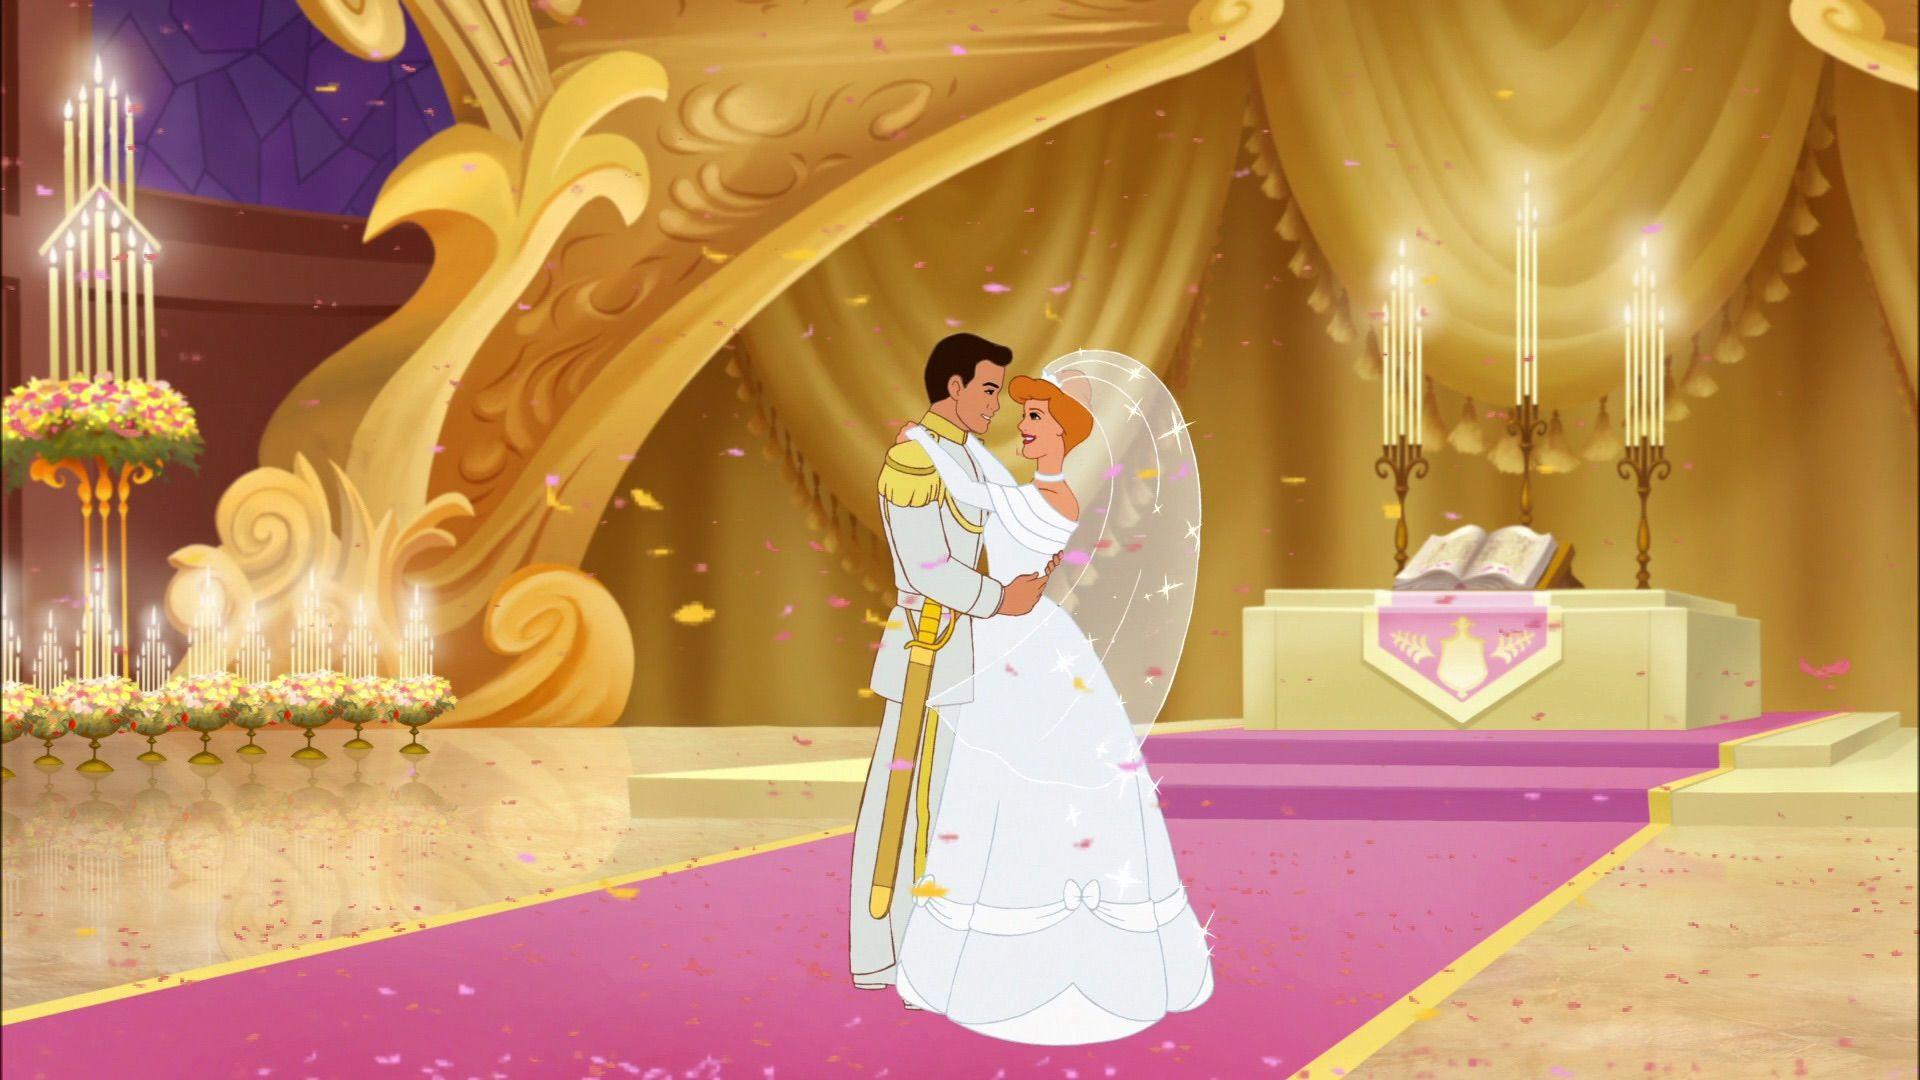 cinderella and prince charmings wedding day cinderella